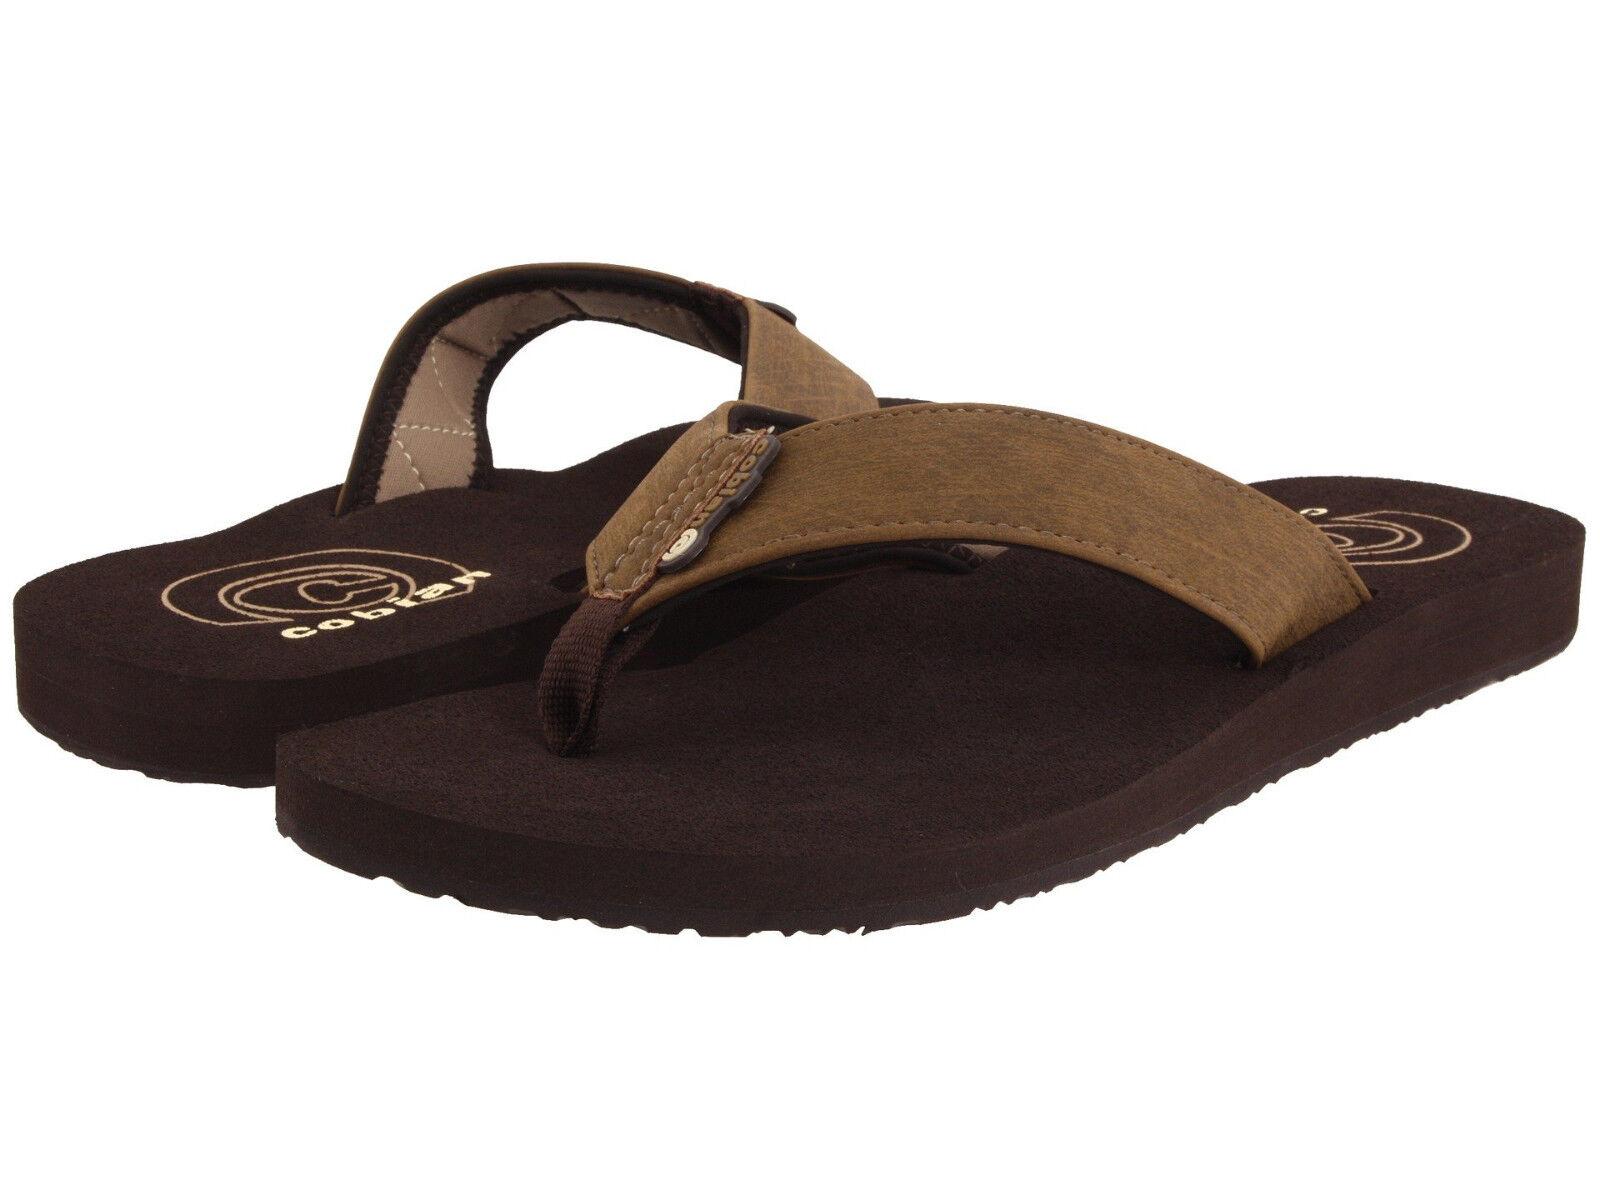 Men Cobian Floater Flip Flop Sandal FLT 08-203 Mocha 100% Authentic Brand New